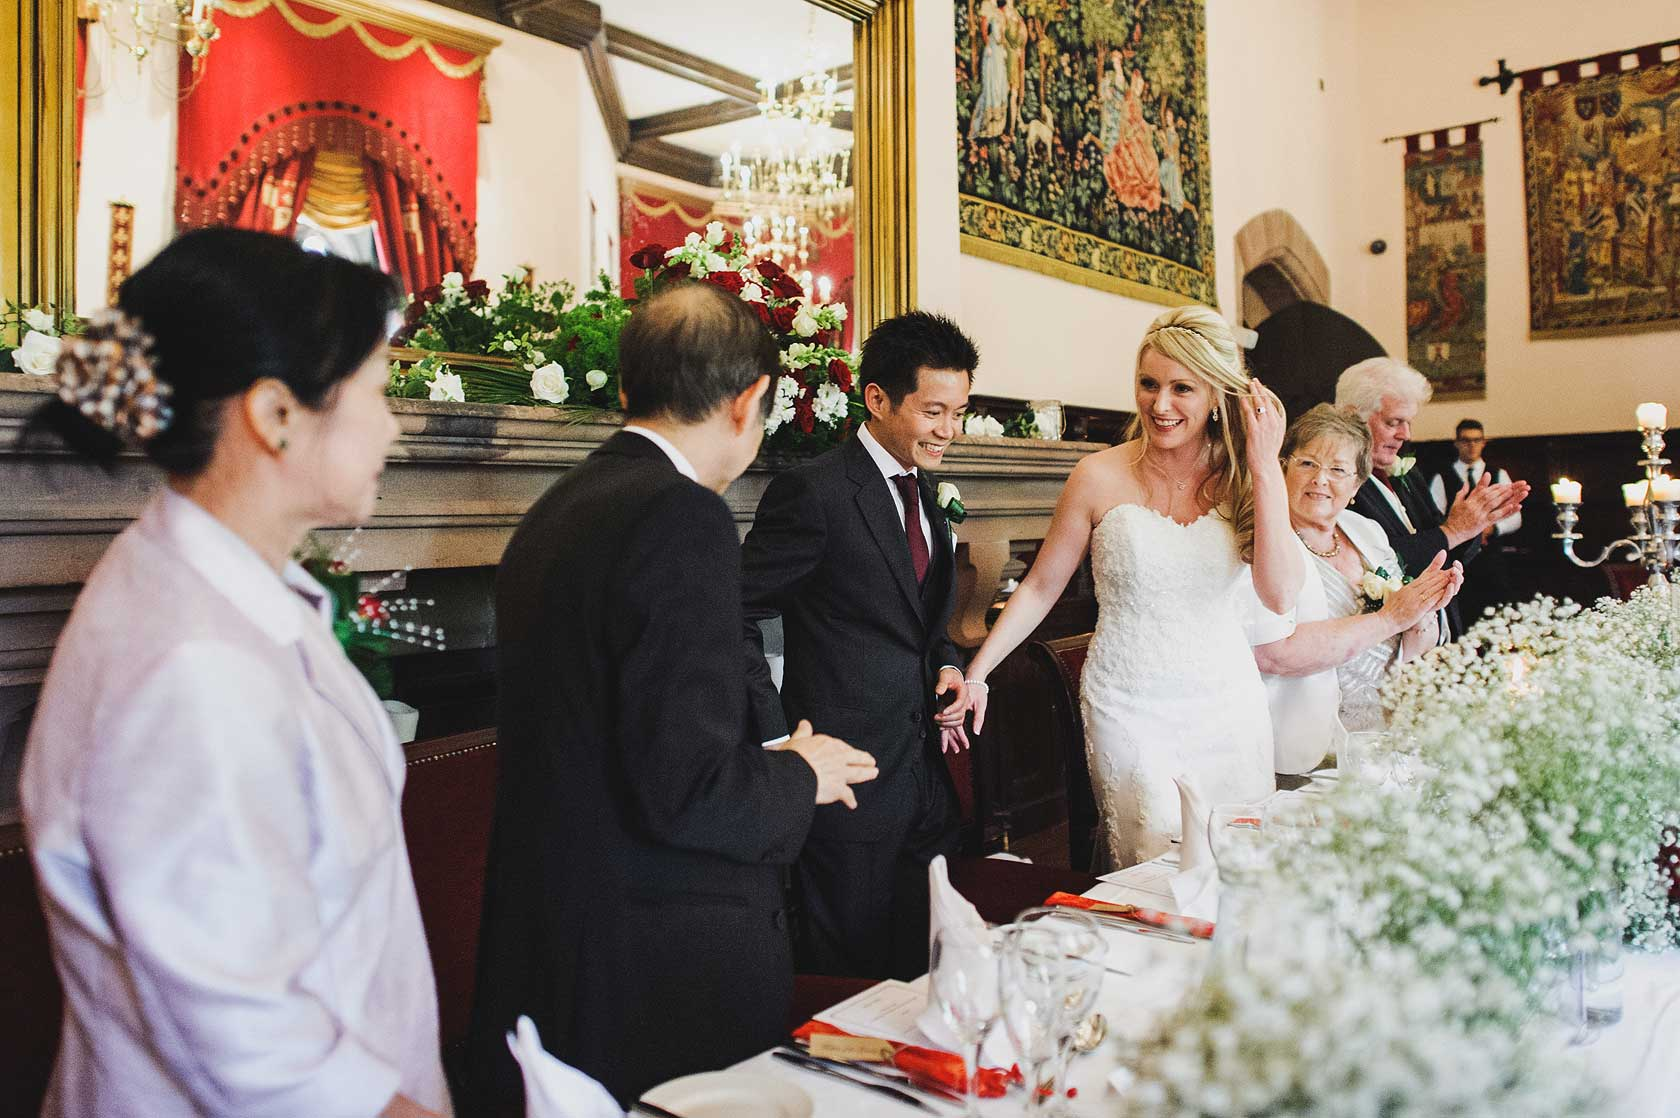 Peckforton Castle Wedding in Cheshire